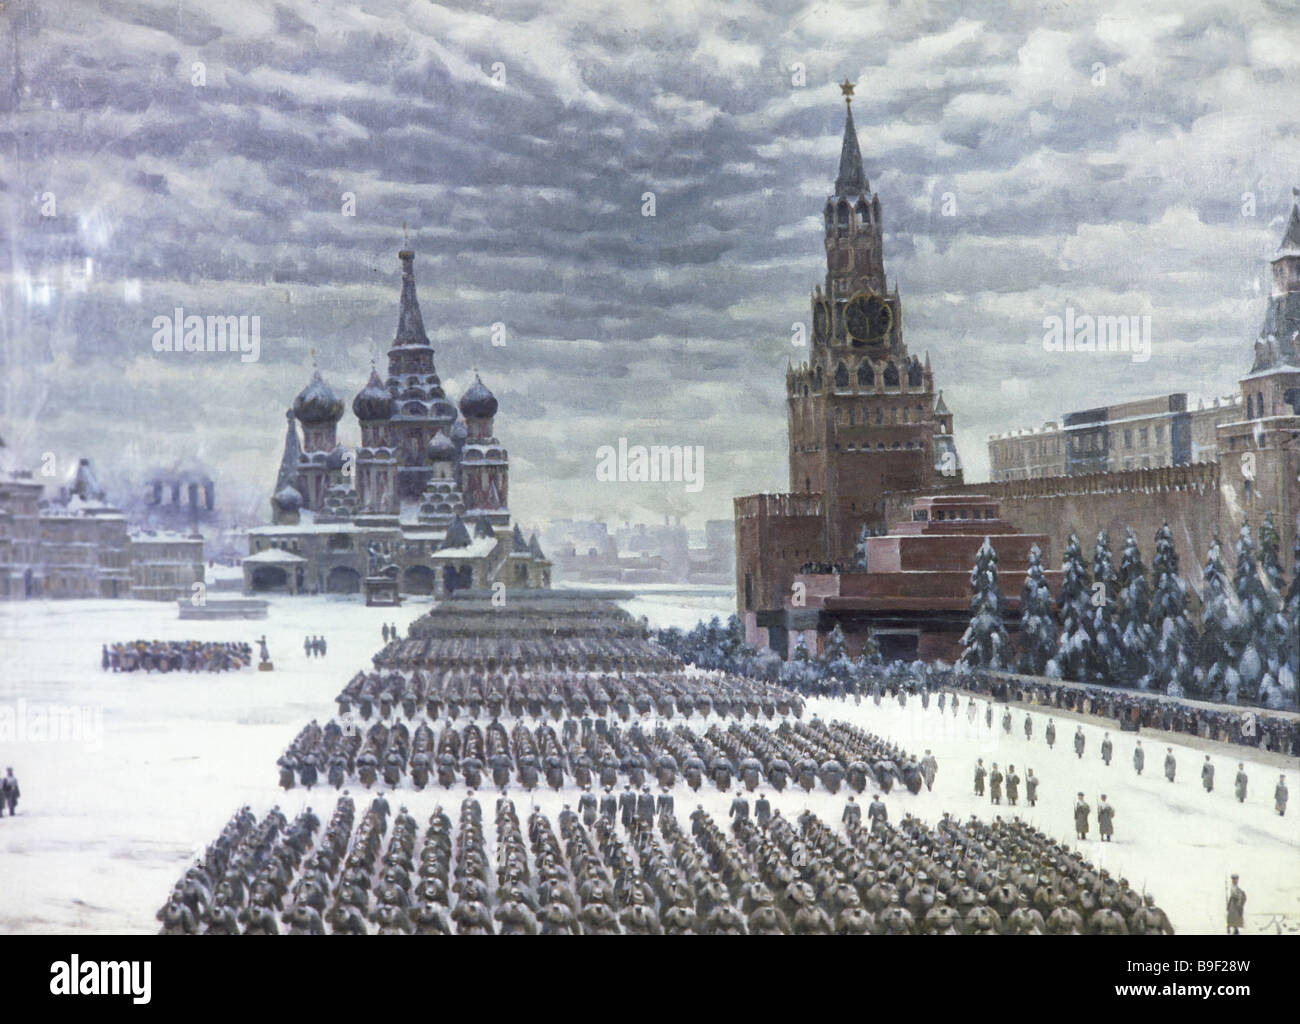 konstantin yuon military parade in red square november 7